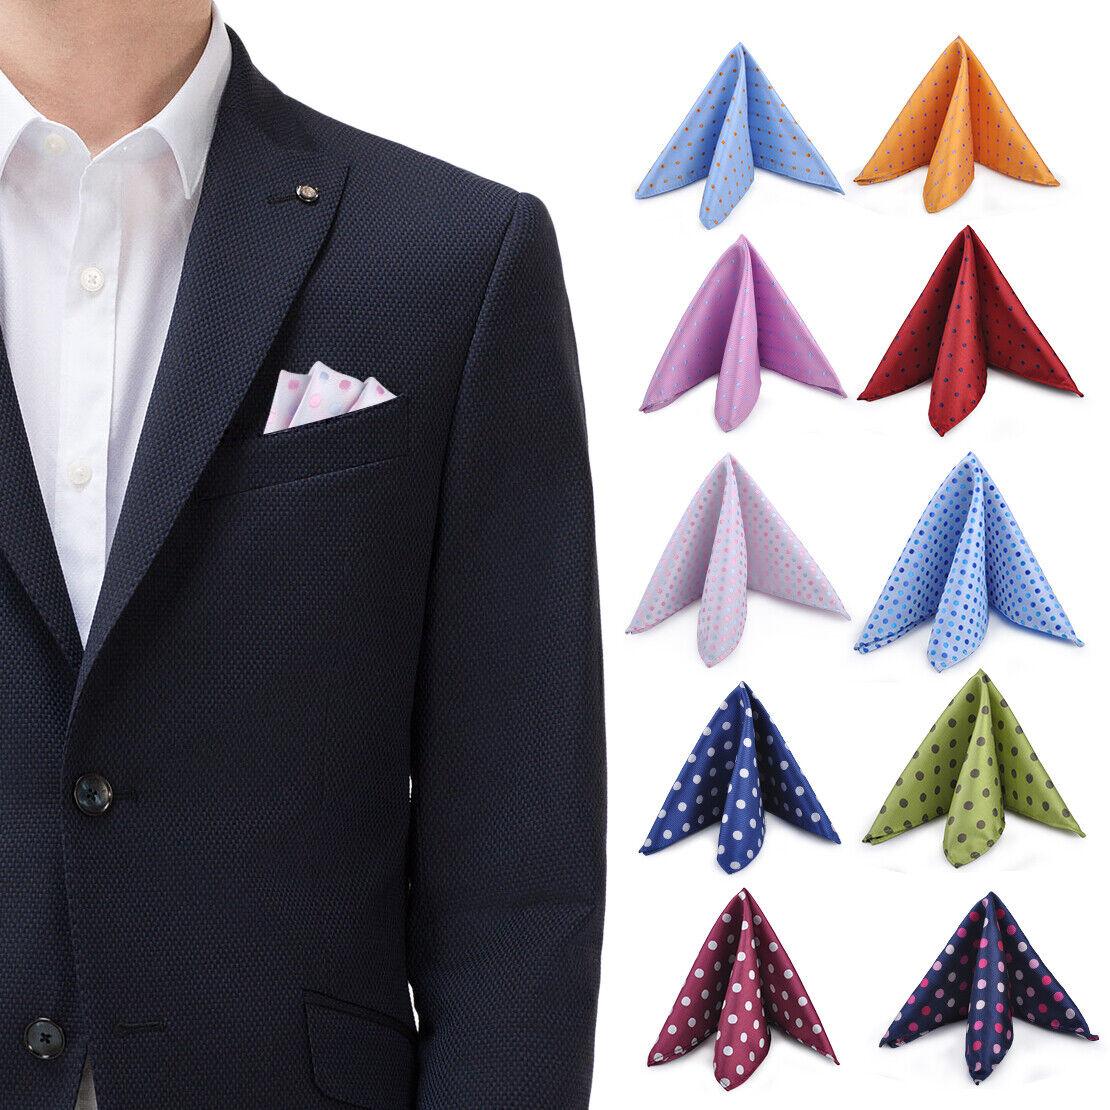 25cm Men Pocket Square Jacquard Handkerchief Polka Dot Handy Gift Wedding Party